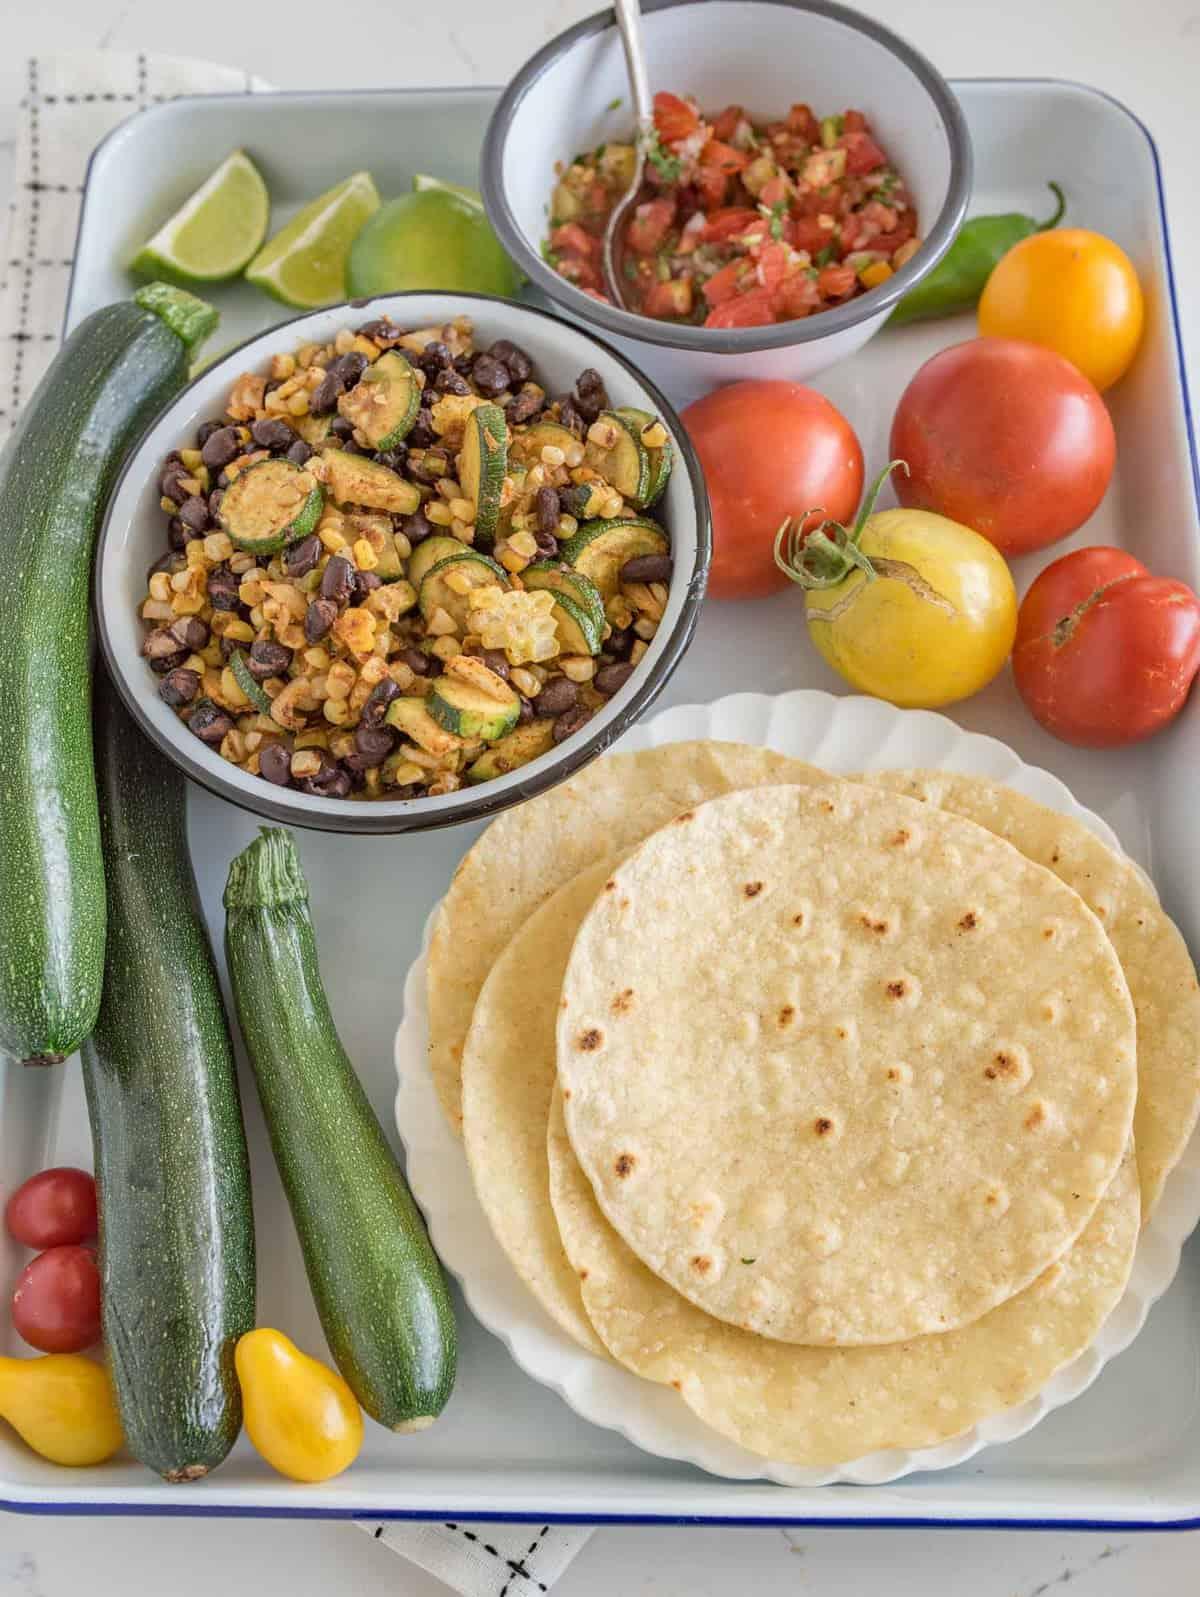 Image of a Roasted Zucchini, Corn & Black Bean Taco Platter